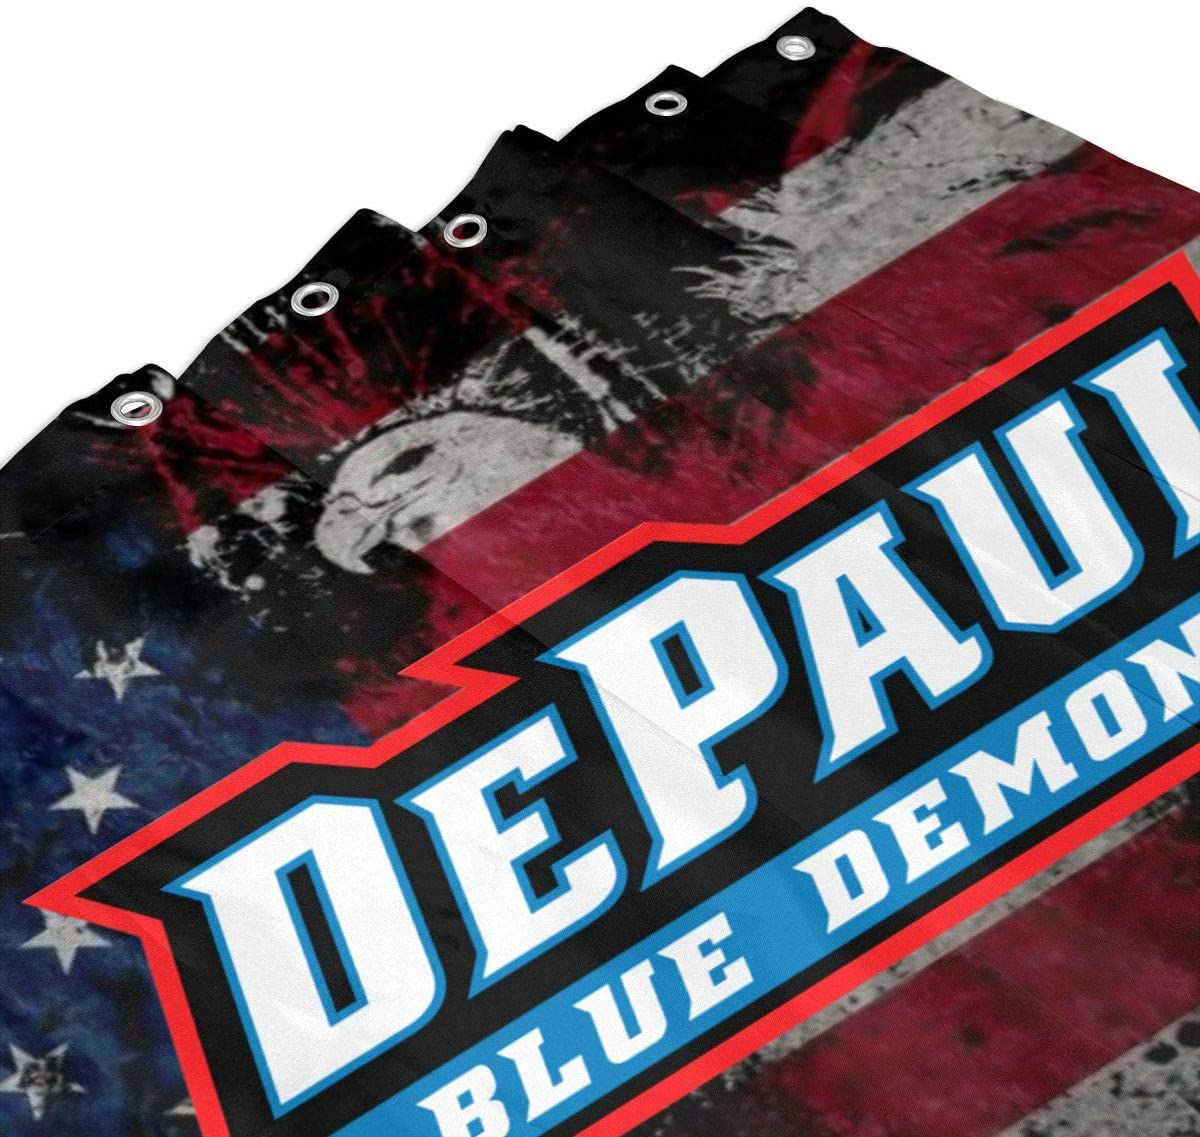 Littlearth DePaul Blue Demons Shower Curtain Waterproof Outdoor Bathroom Curtain Football Logo Curtain Set 60x72in